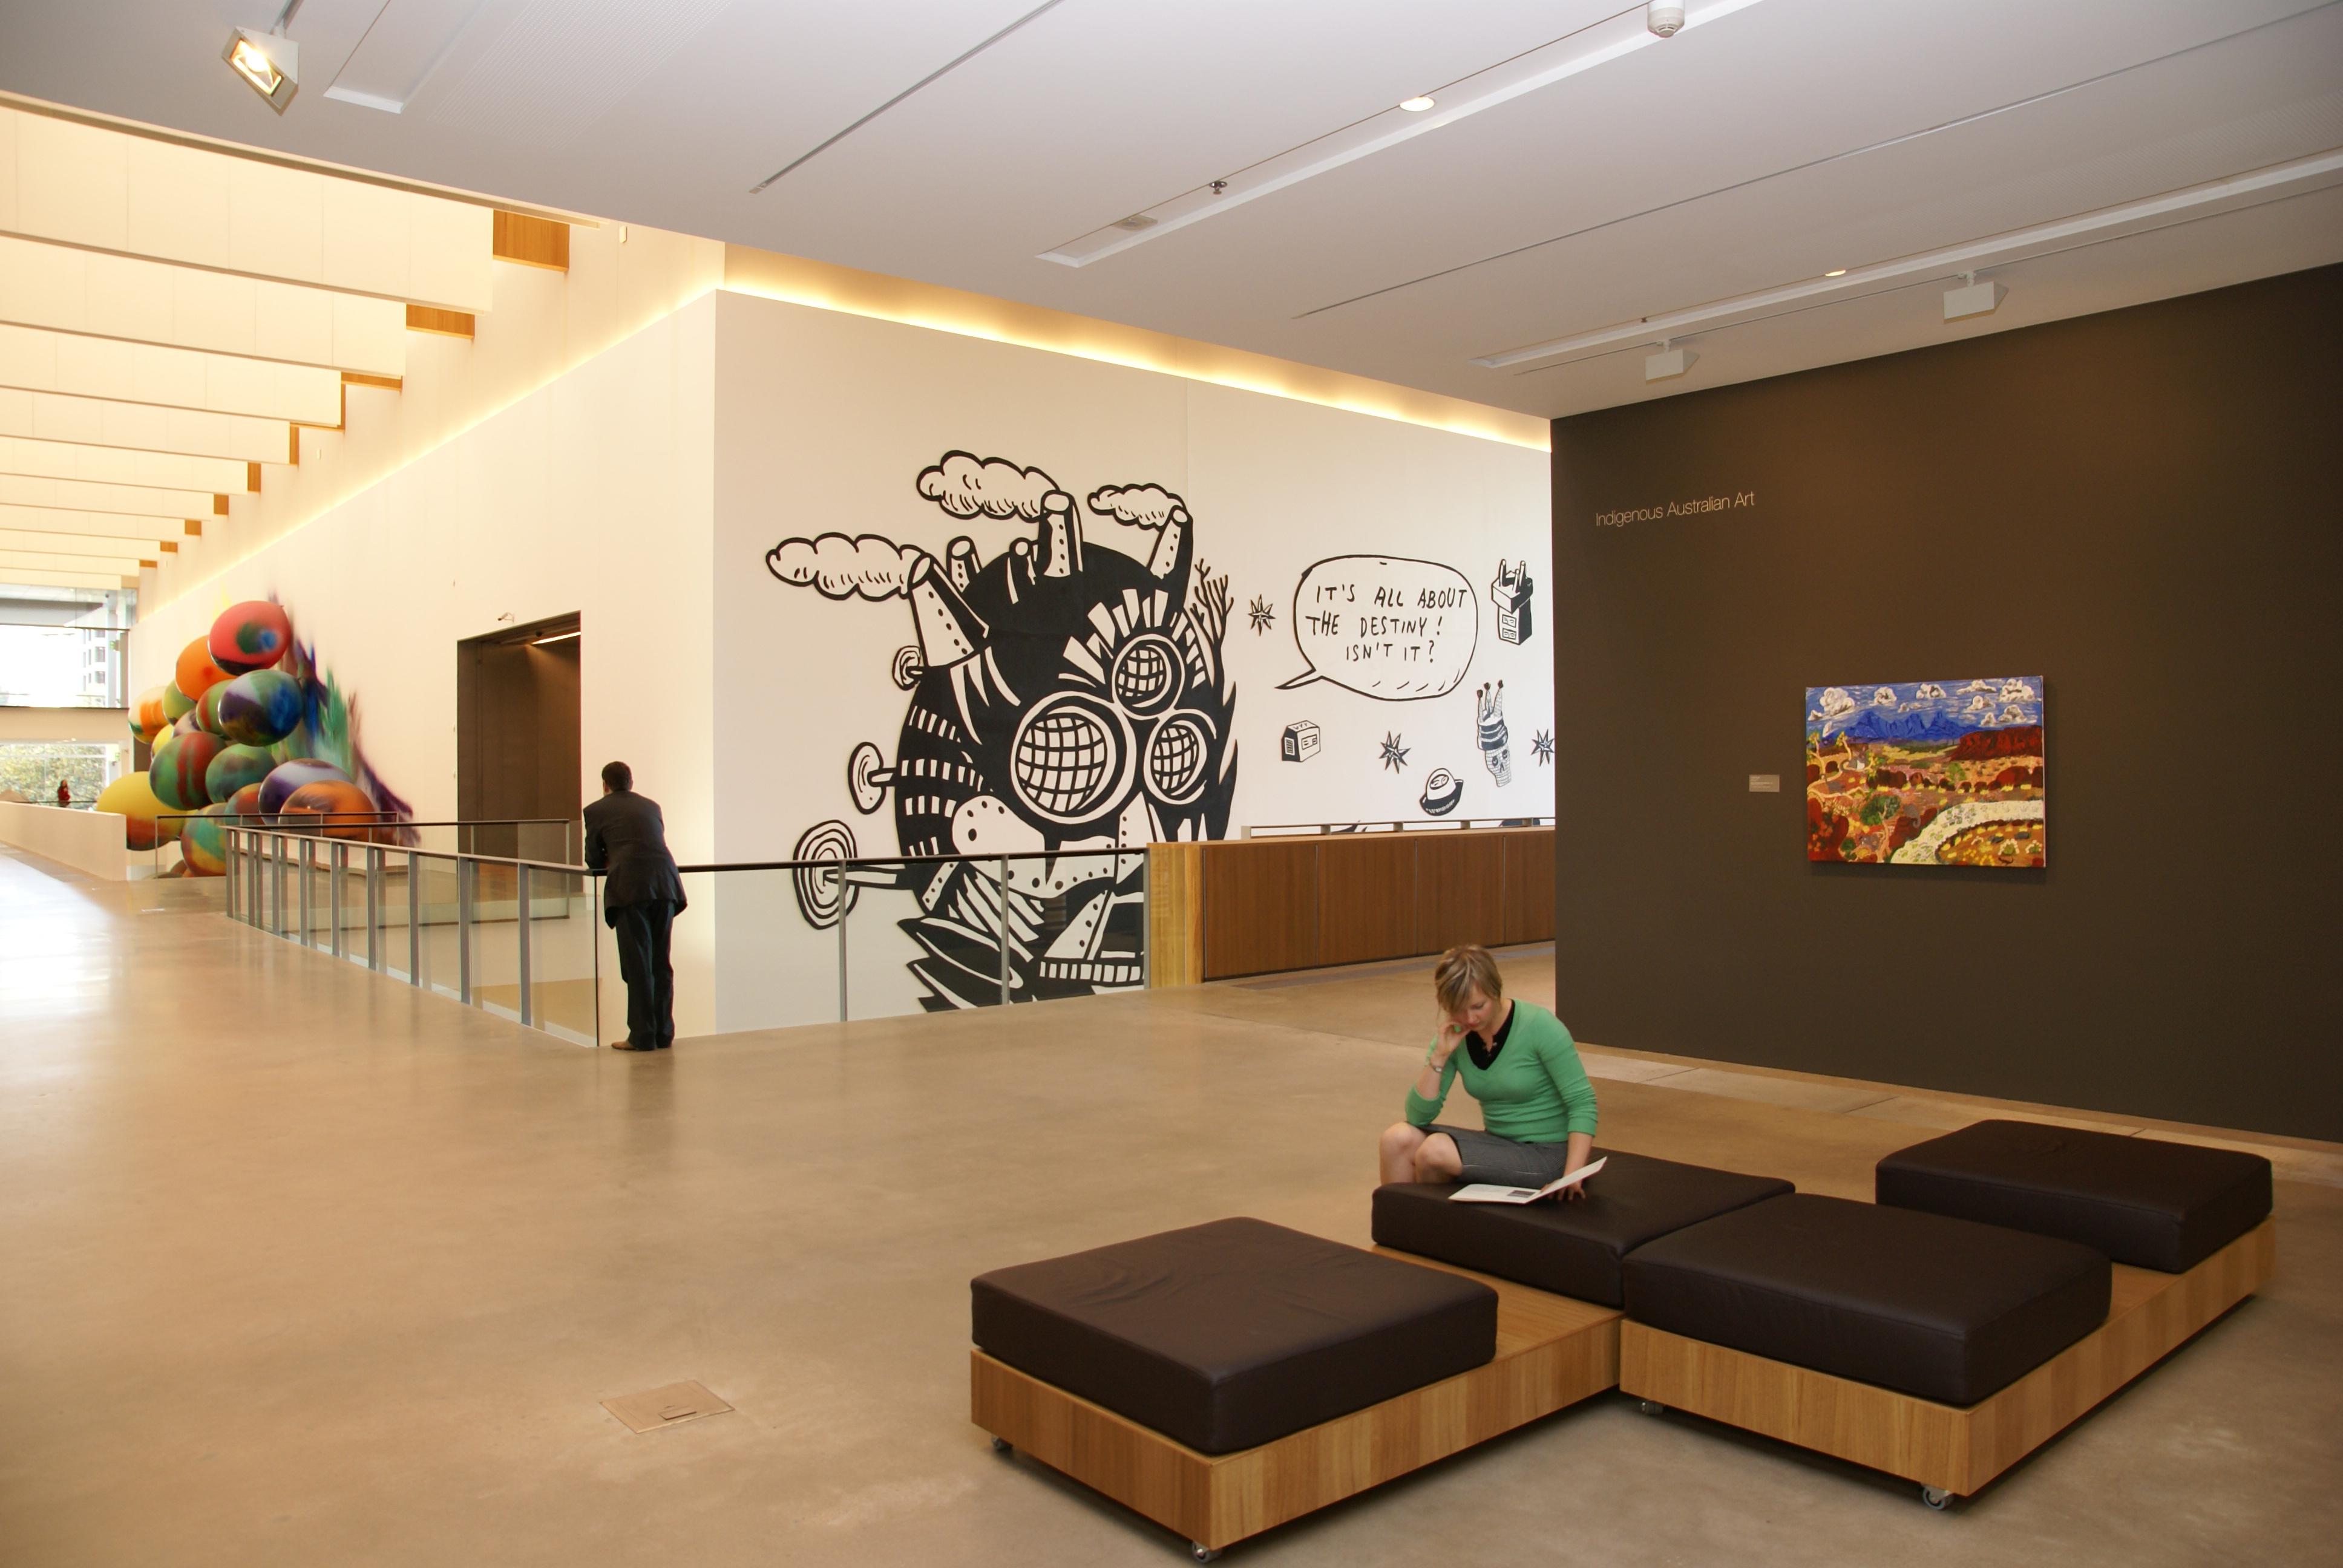 Queensland Gallery Of Modern Art Interior Raylinc Lighting